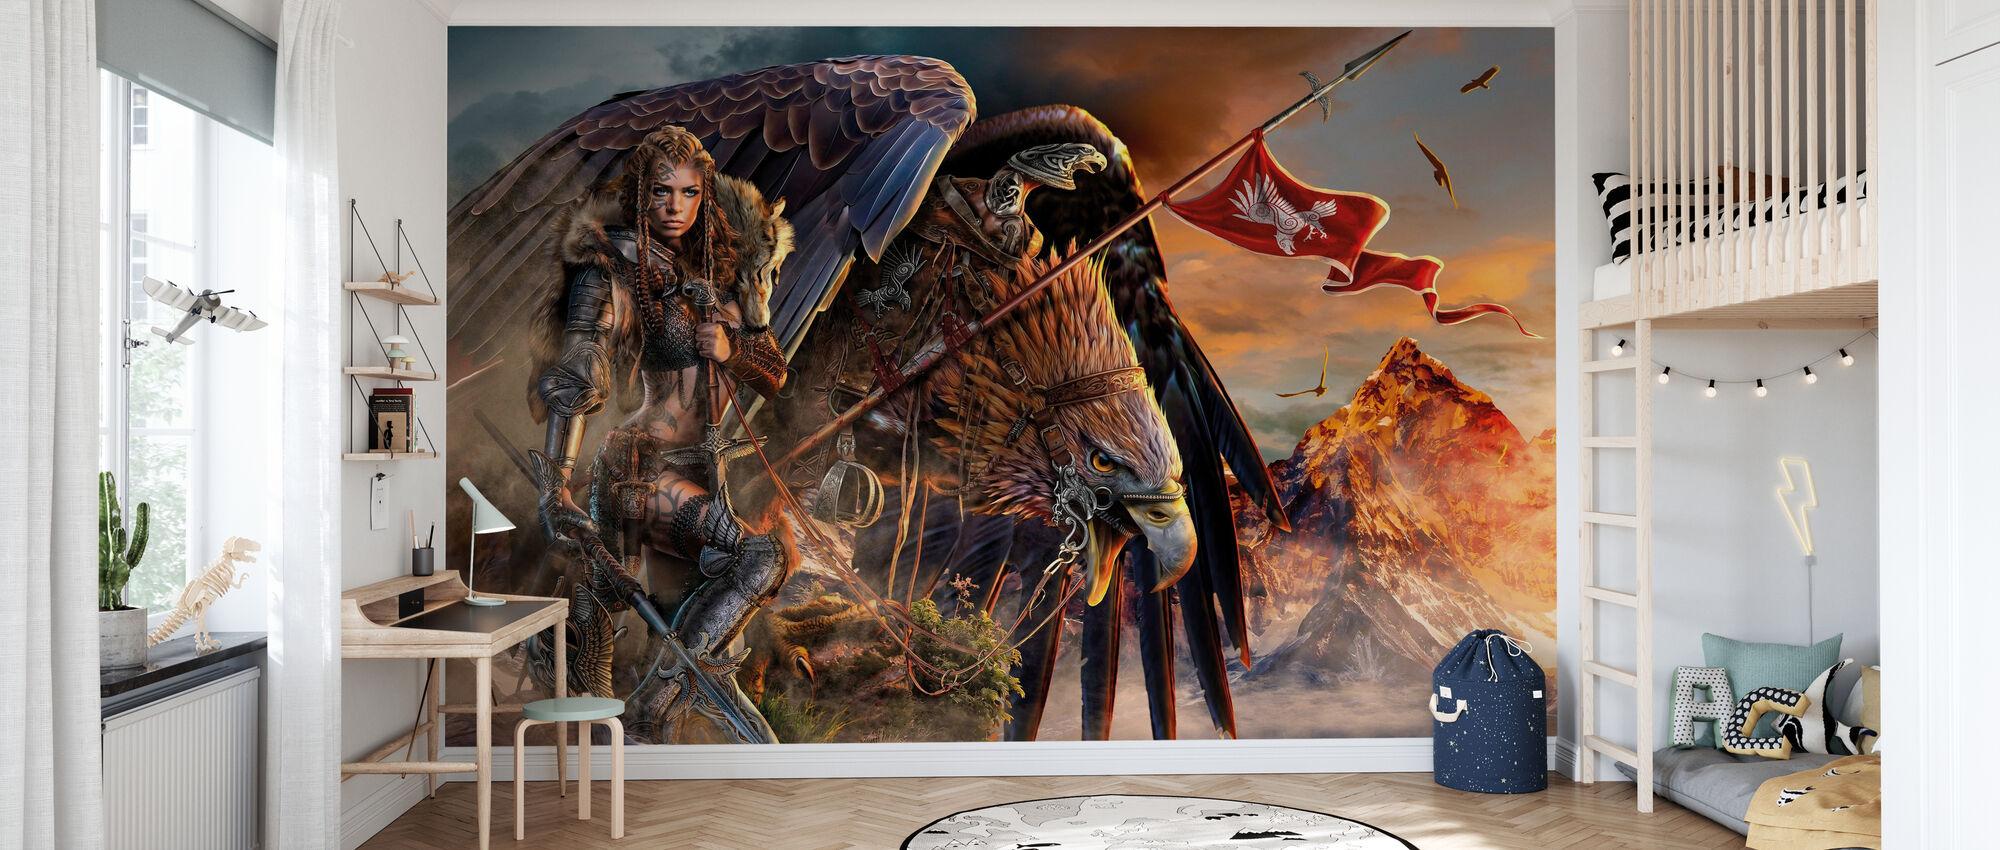 Eagle Rider - Wallpaper - Kids Room